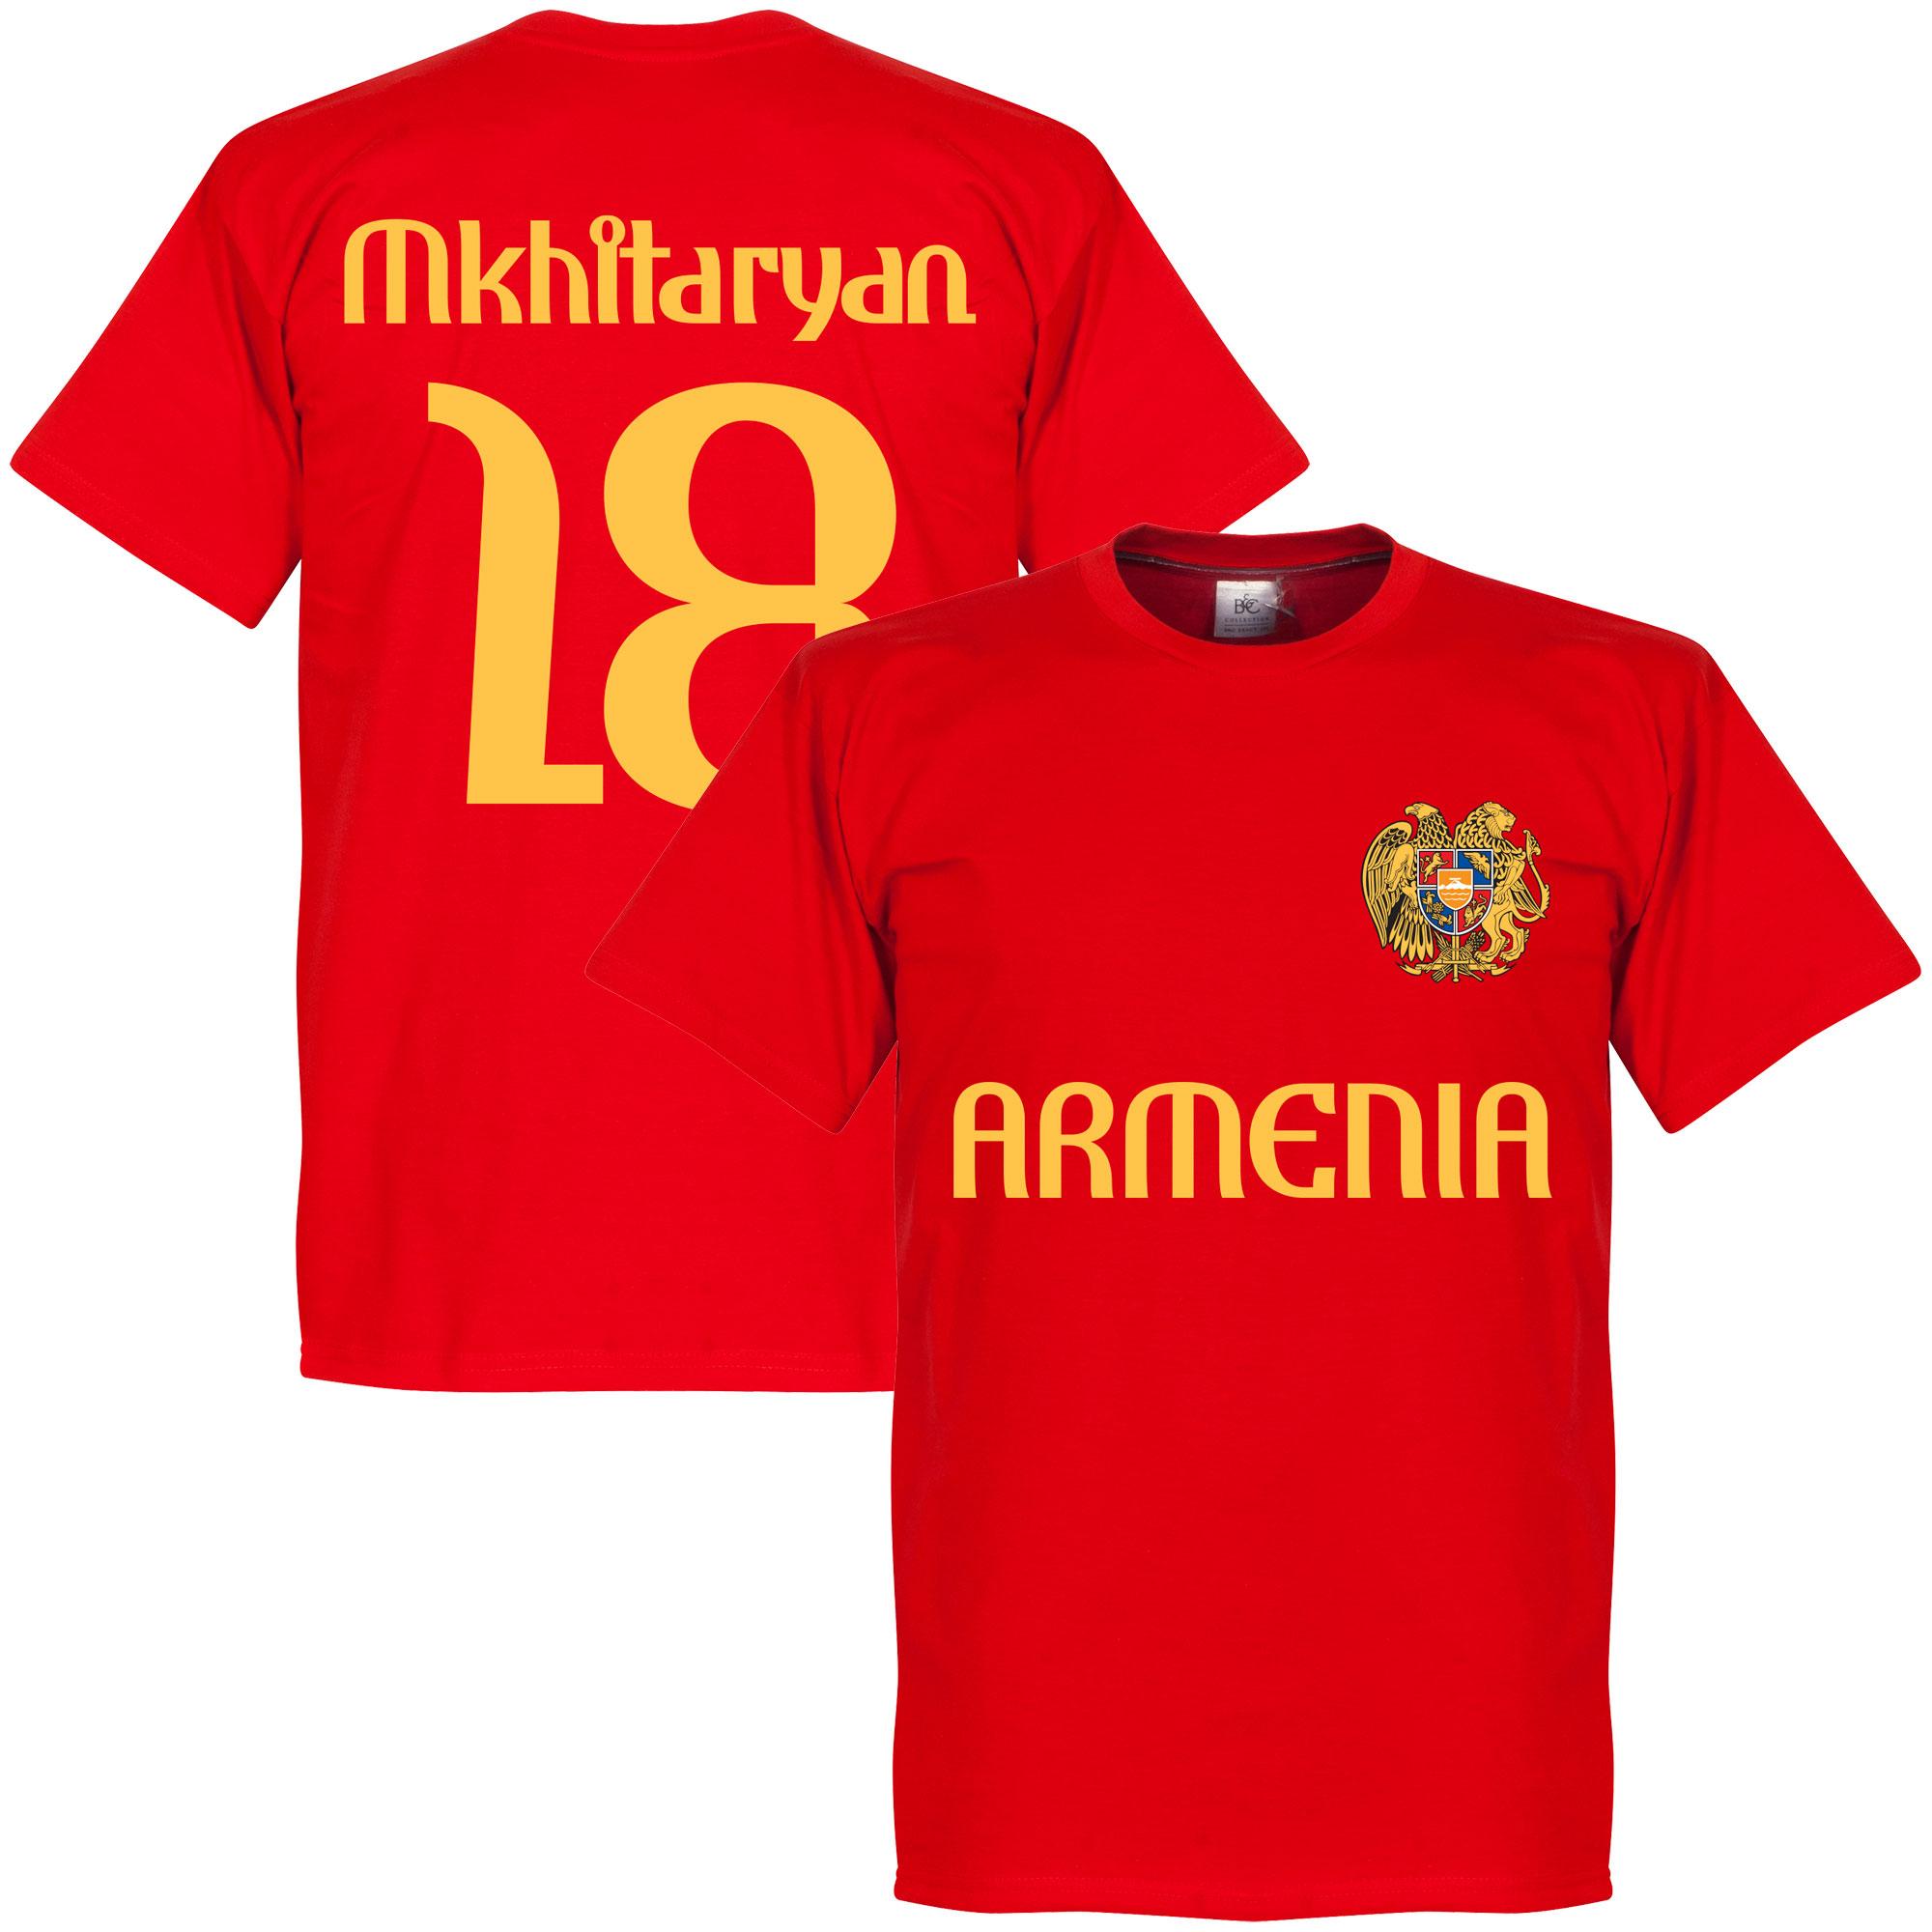 Armenia Mkhitaryan 18 Tee - Red - L